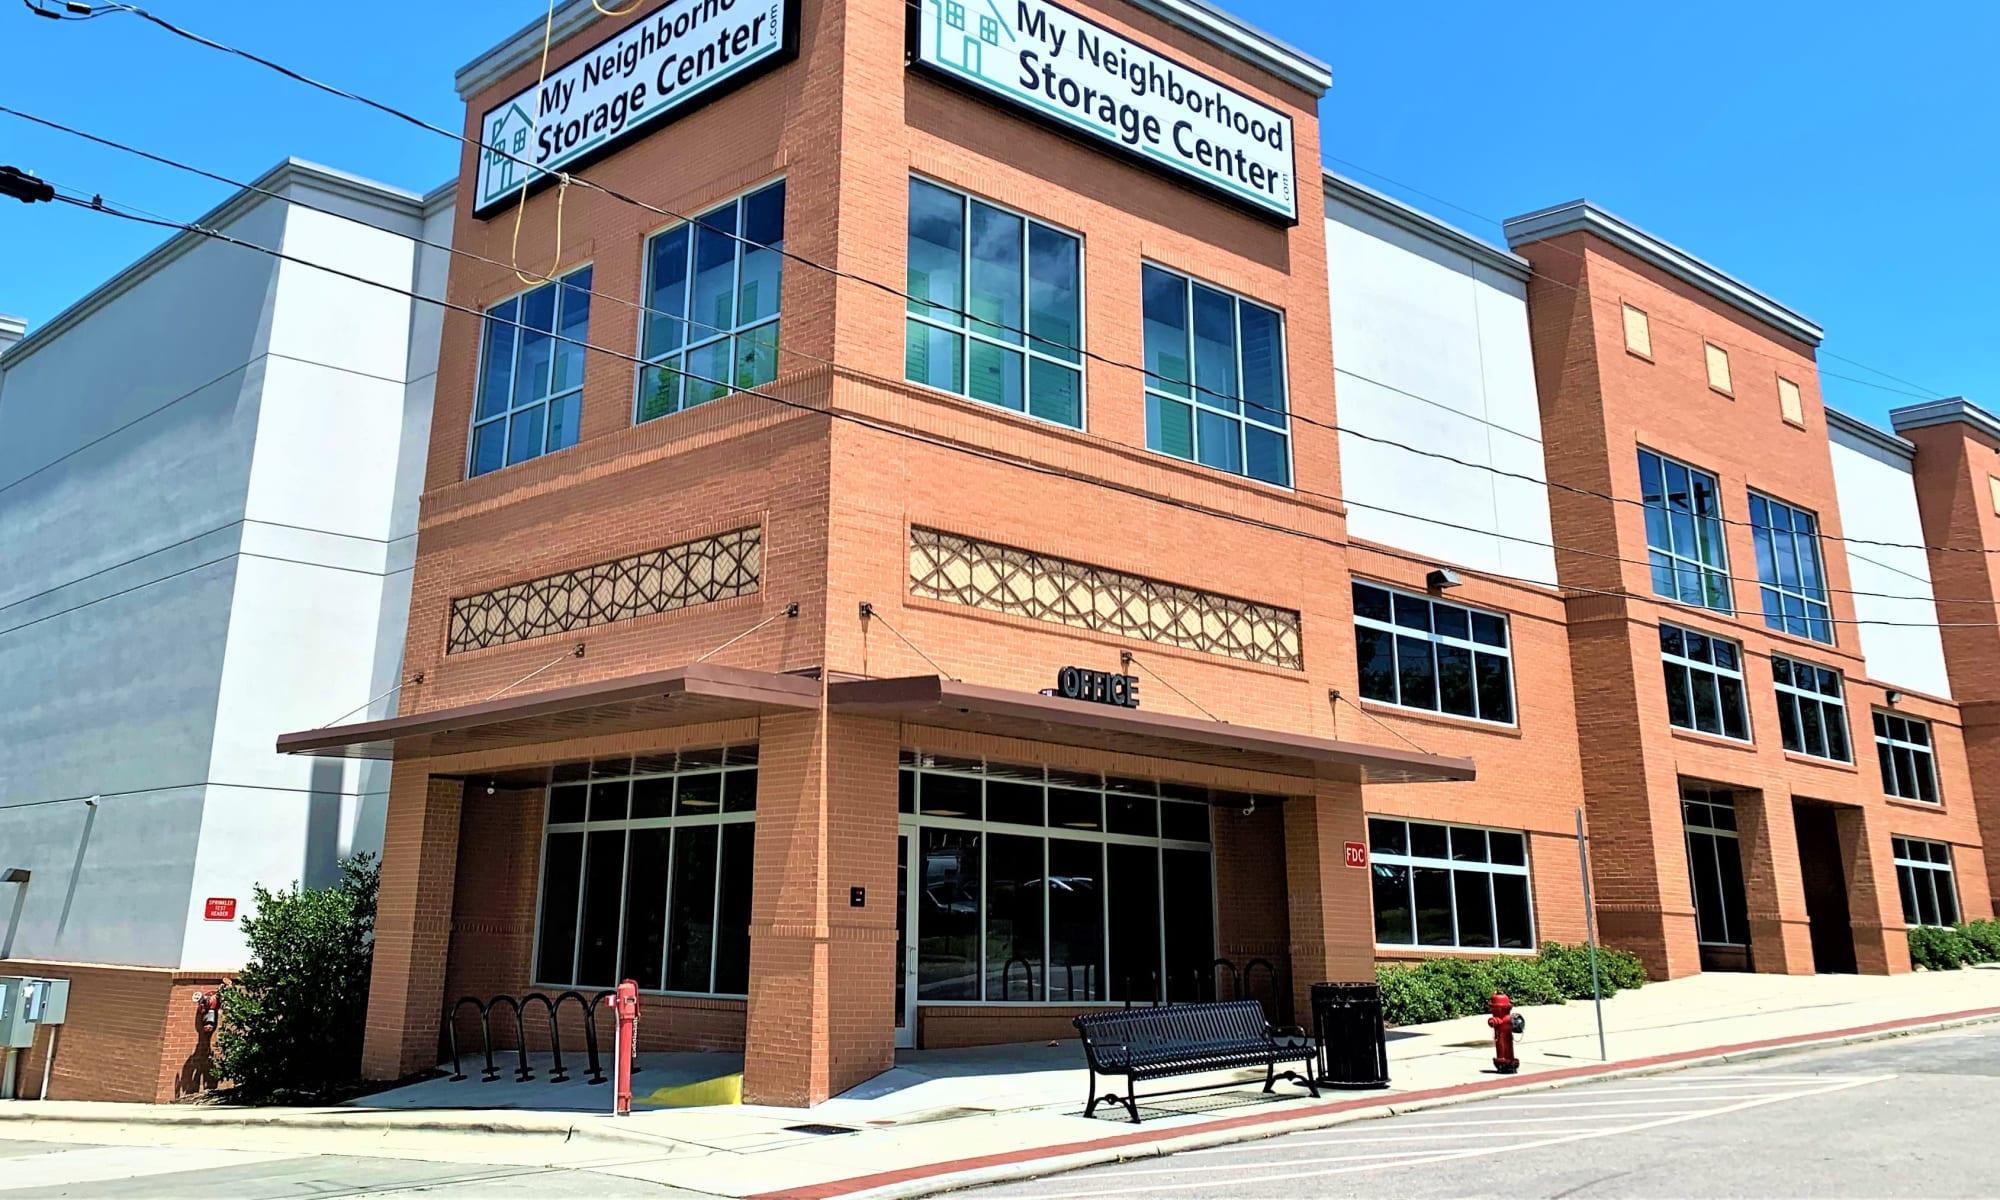 Front entry to My Neighborhood Storage Center in Durham, North Carolina